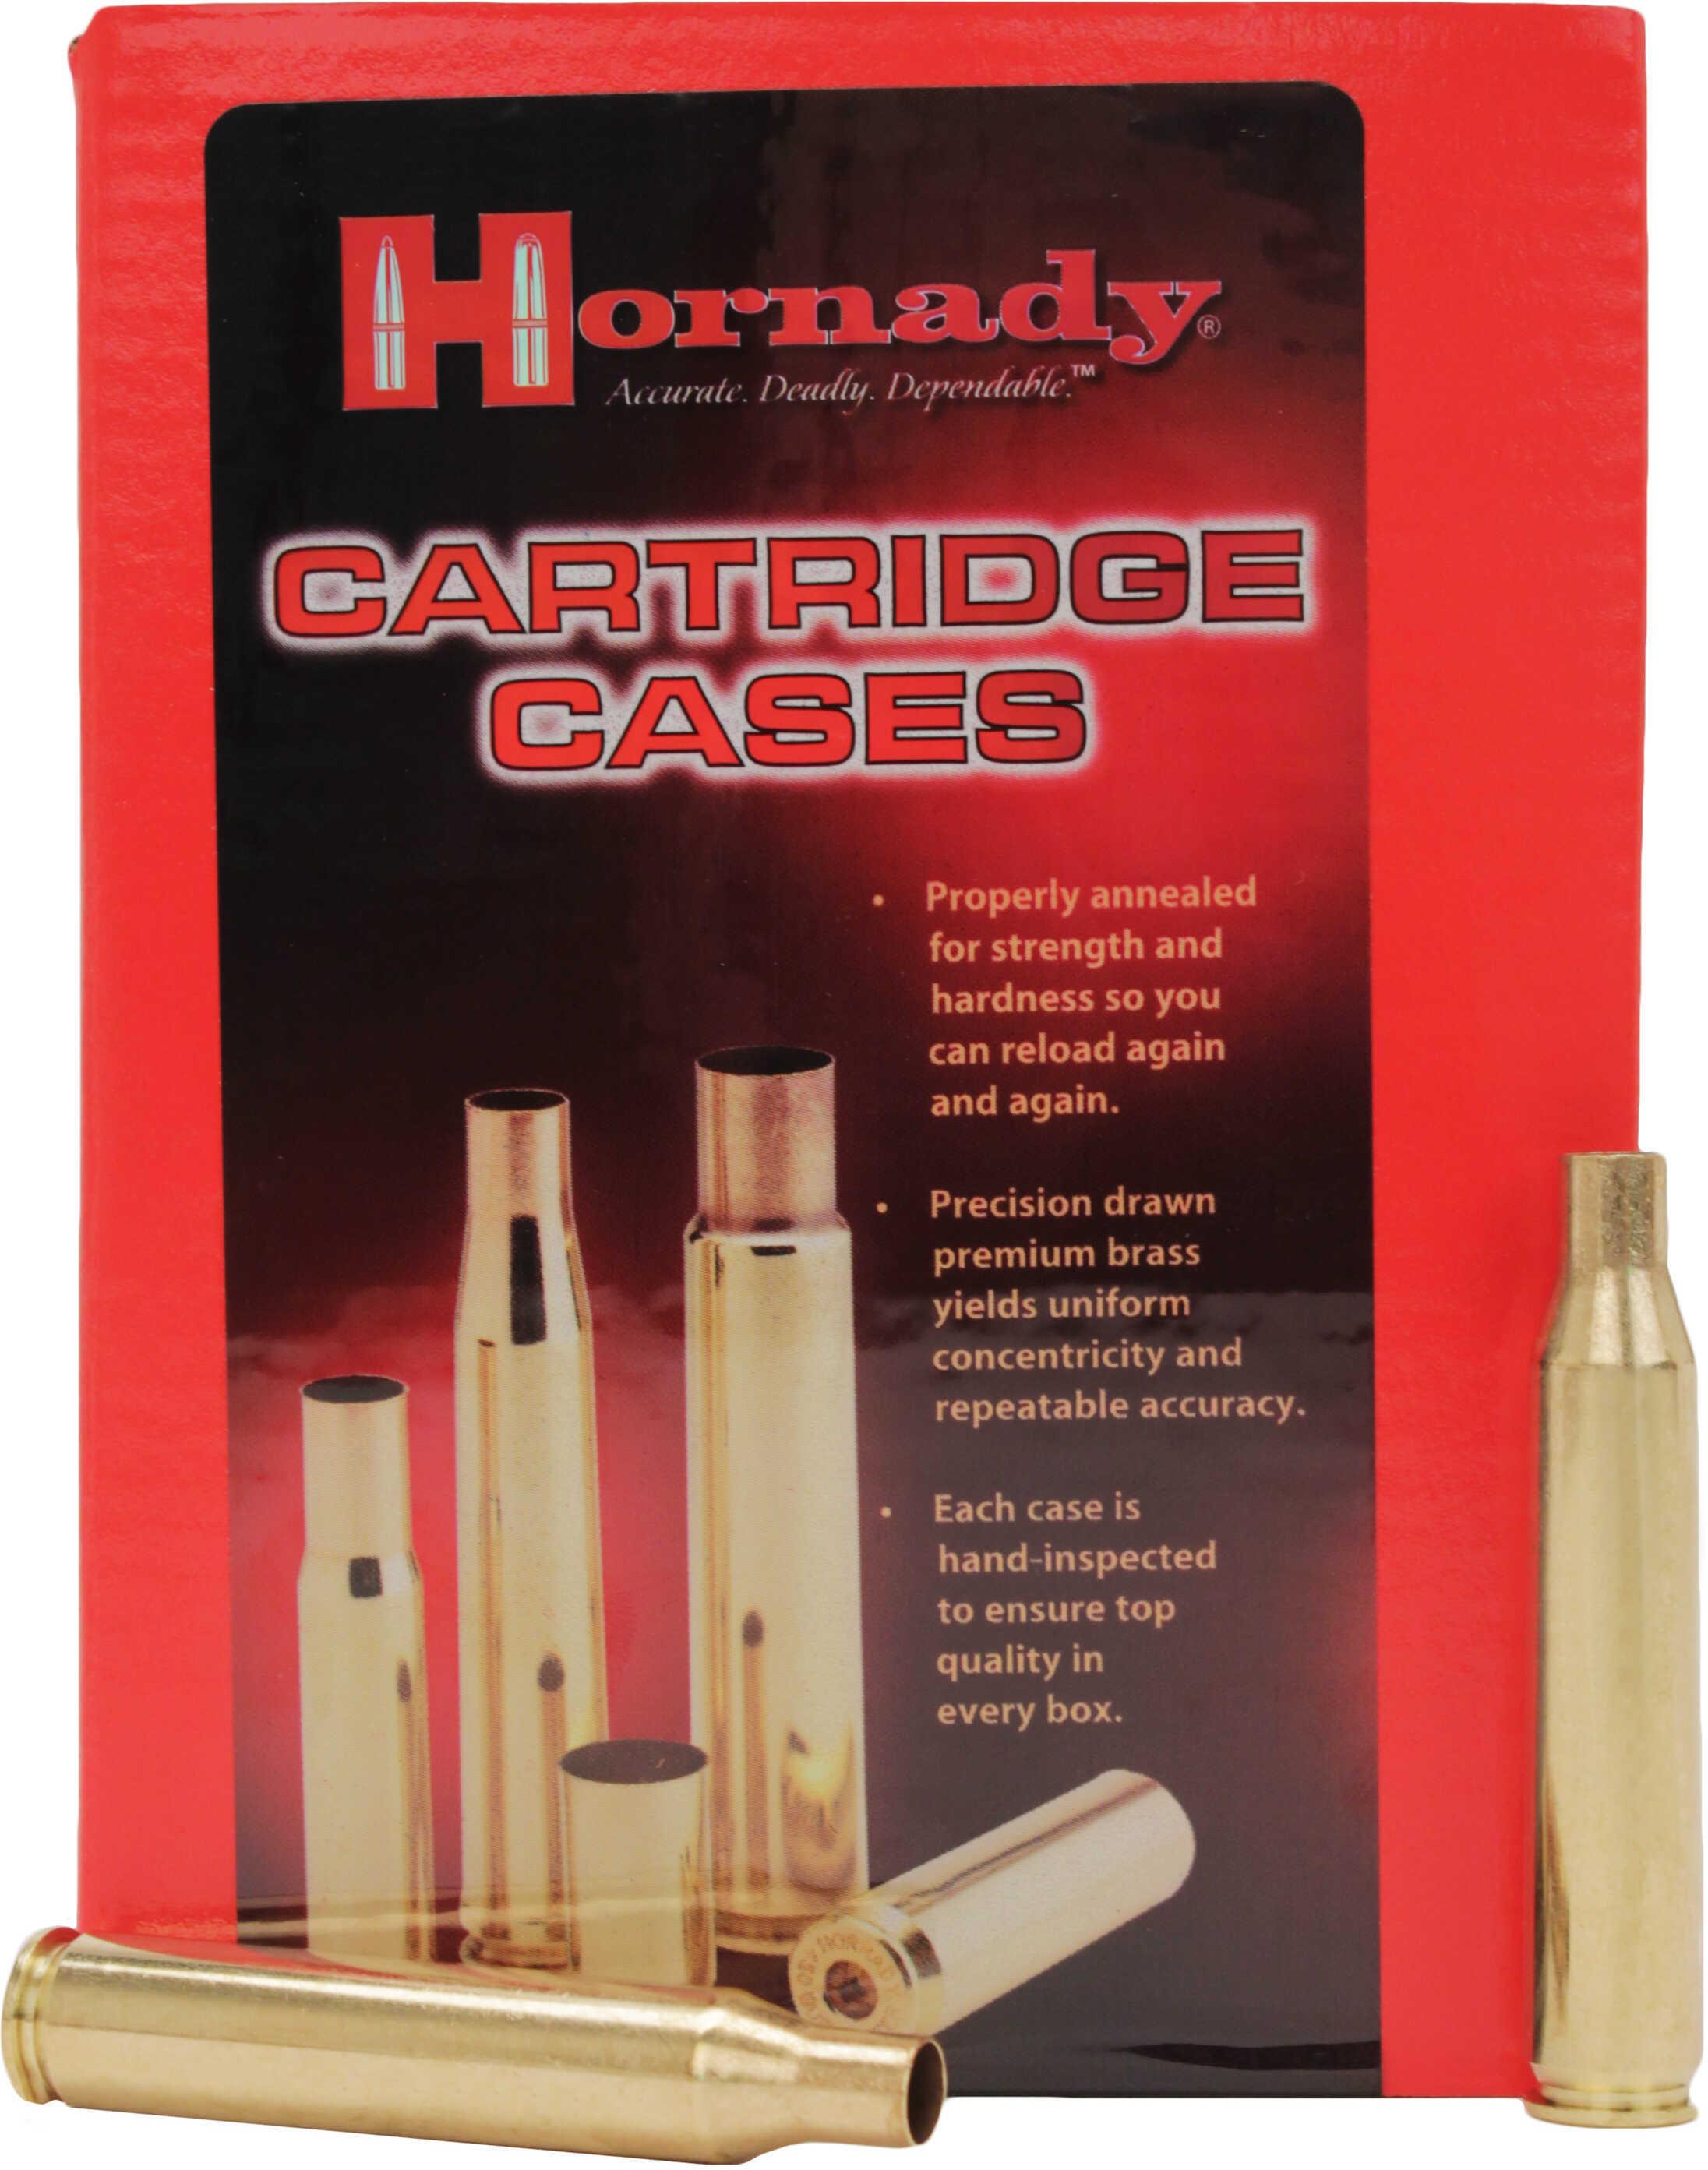 Unprimed Brass By Hornady 25-06 Remington (Per 50) Md: 86251